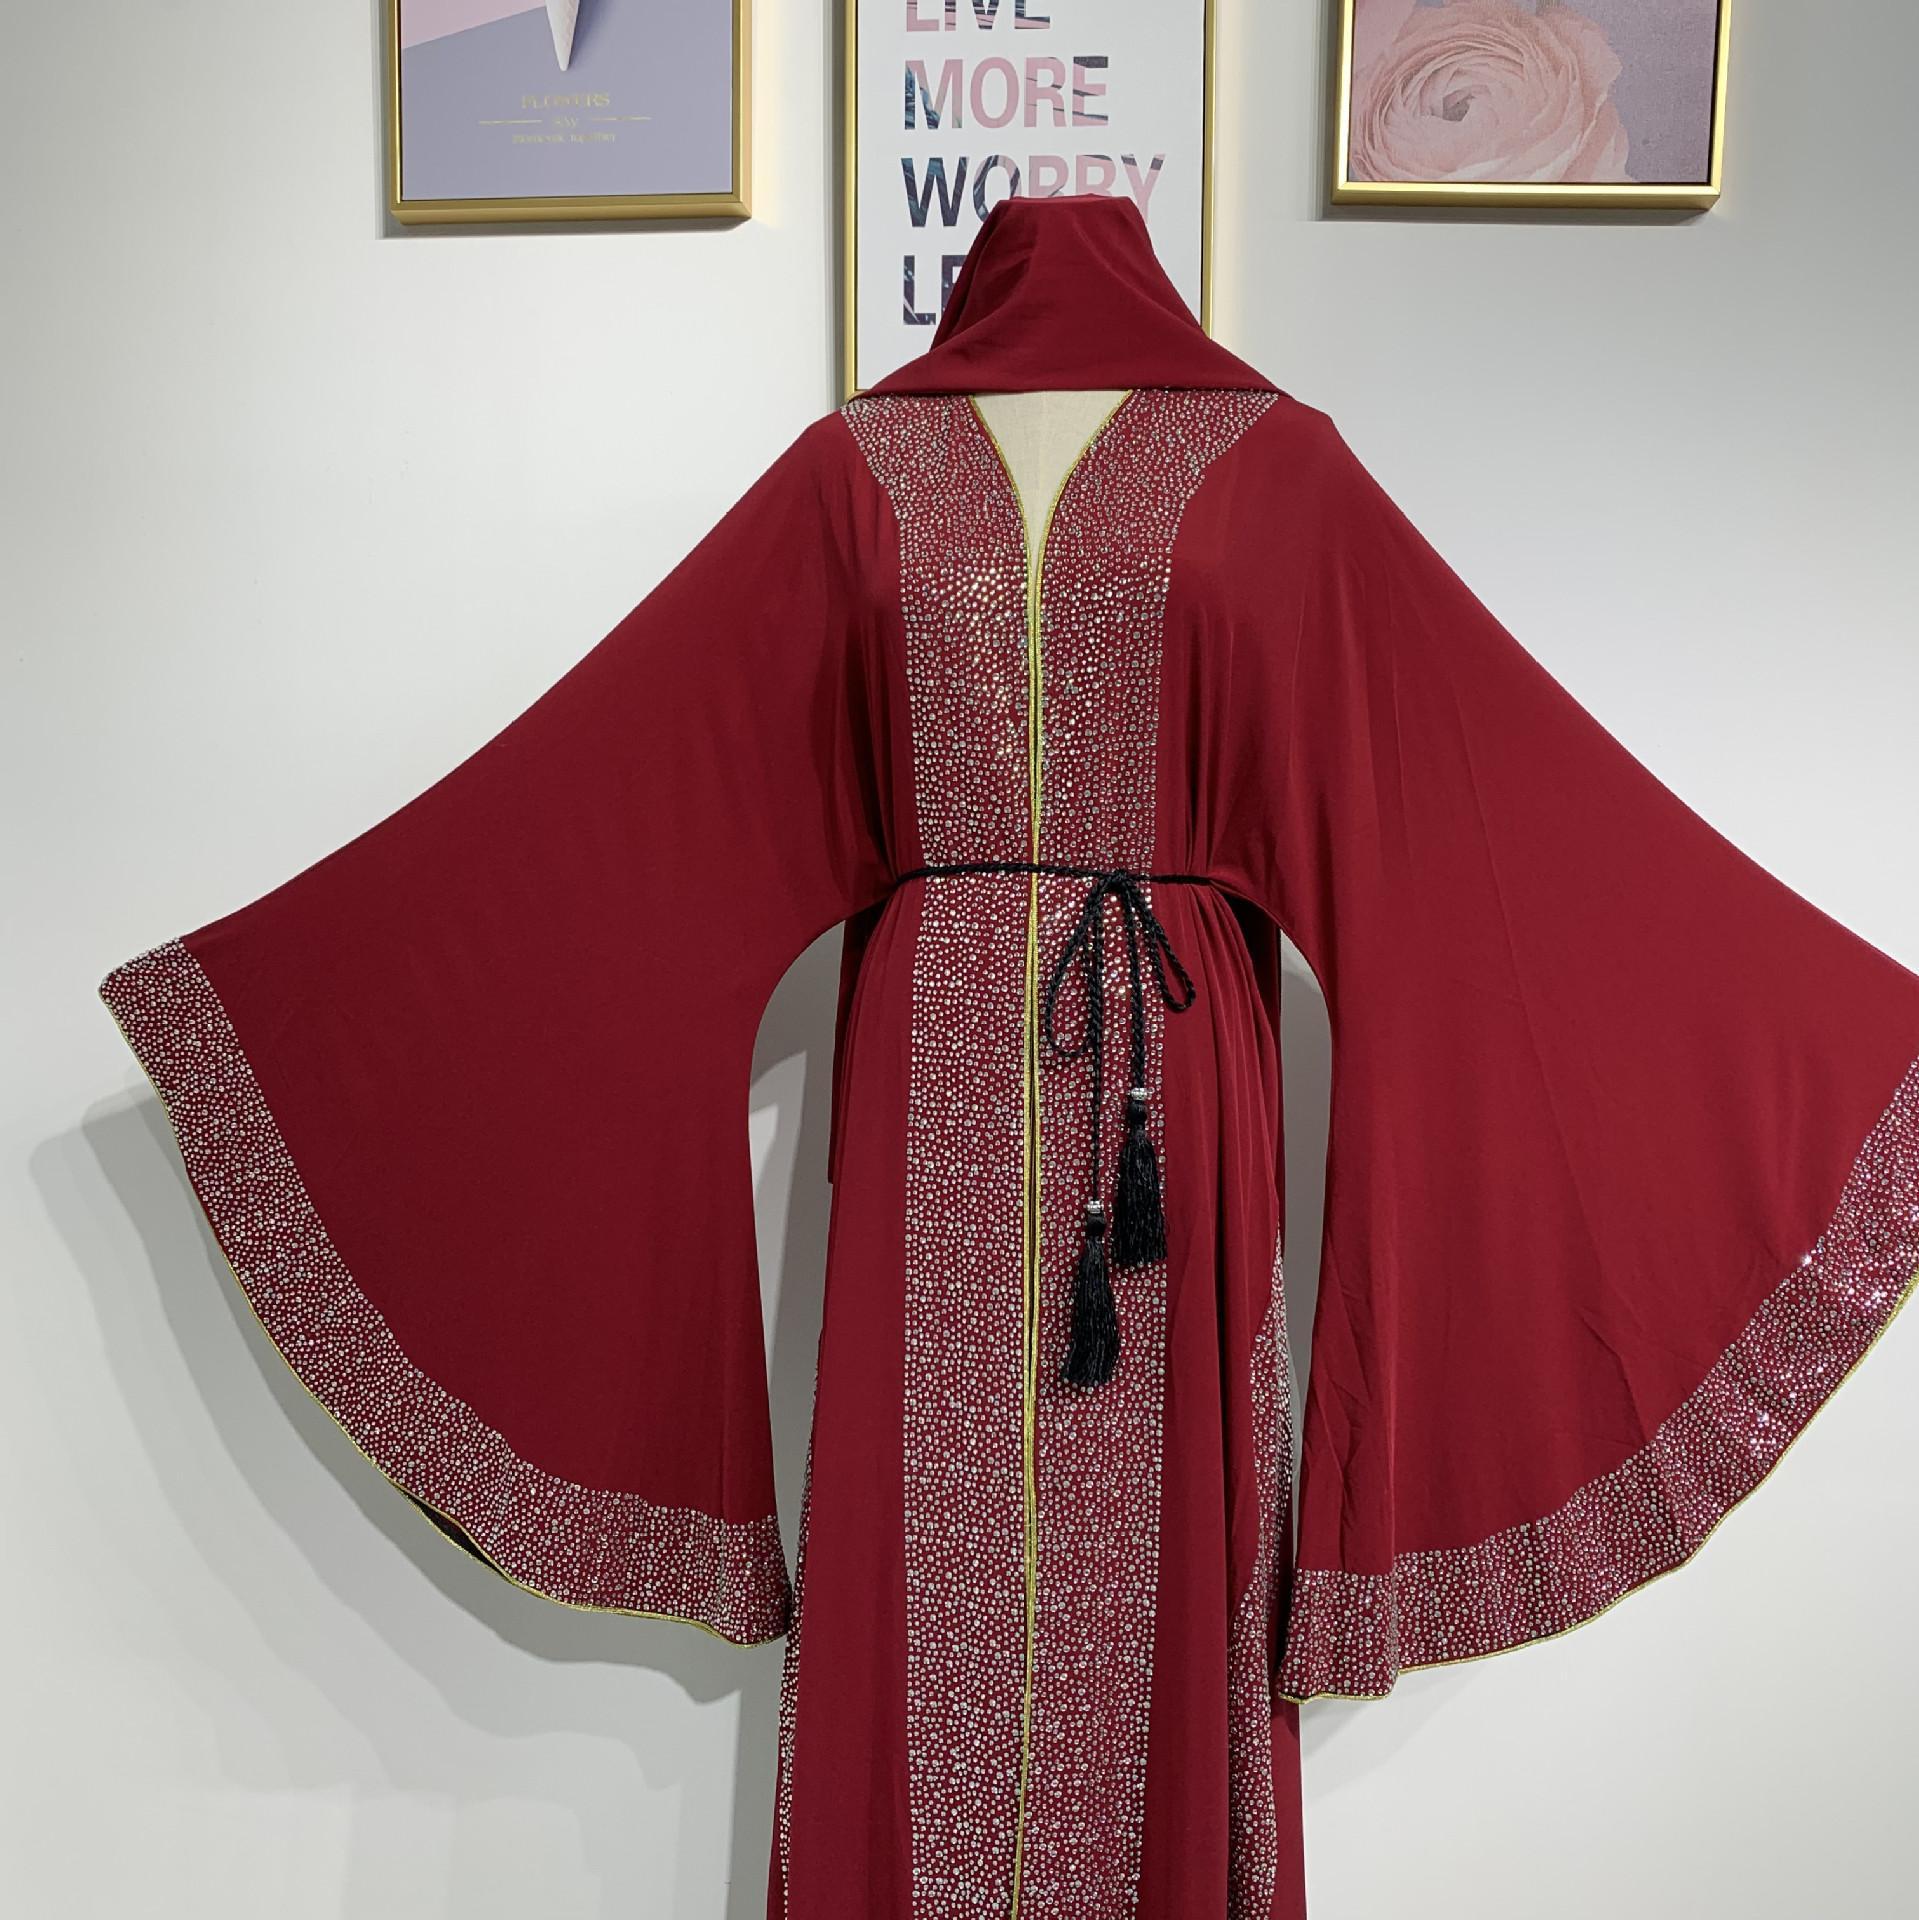 BLING BLACK DUBAI WOMEN FARASHA JILBAB ARABIAN DESIGN FOR WOMEN MS 2019